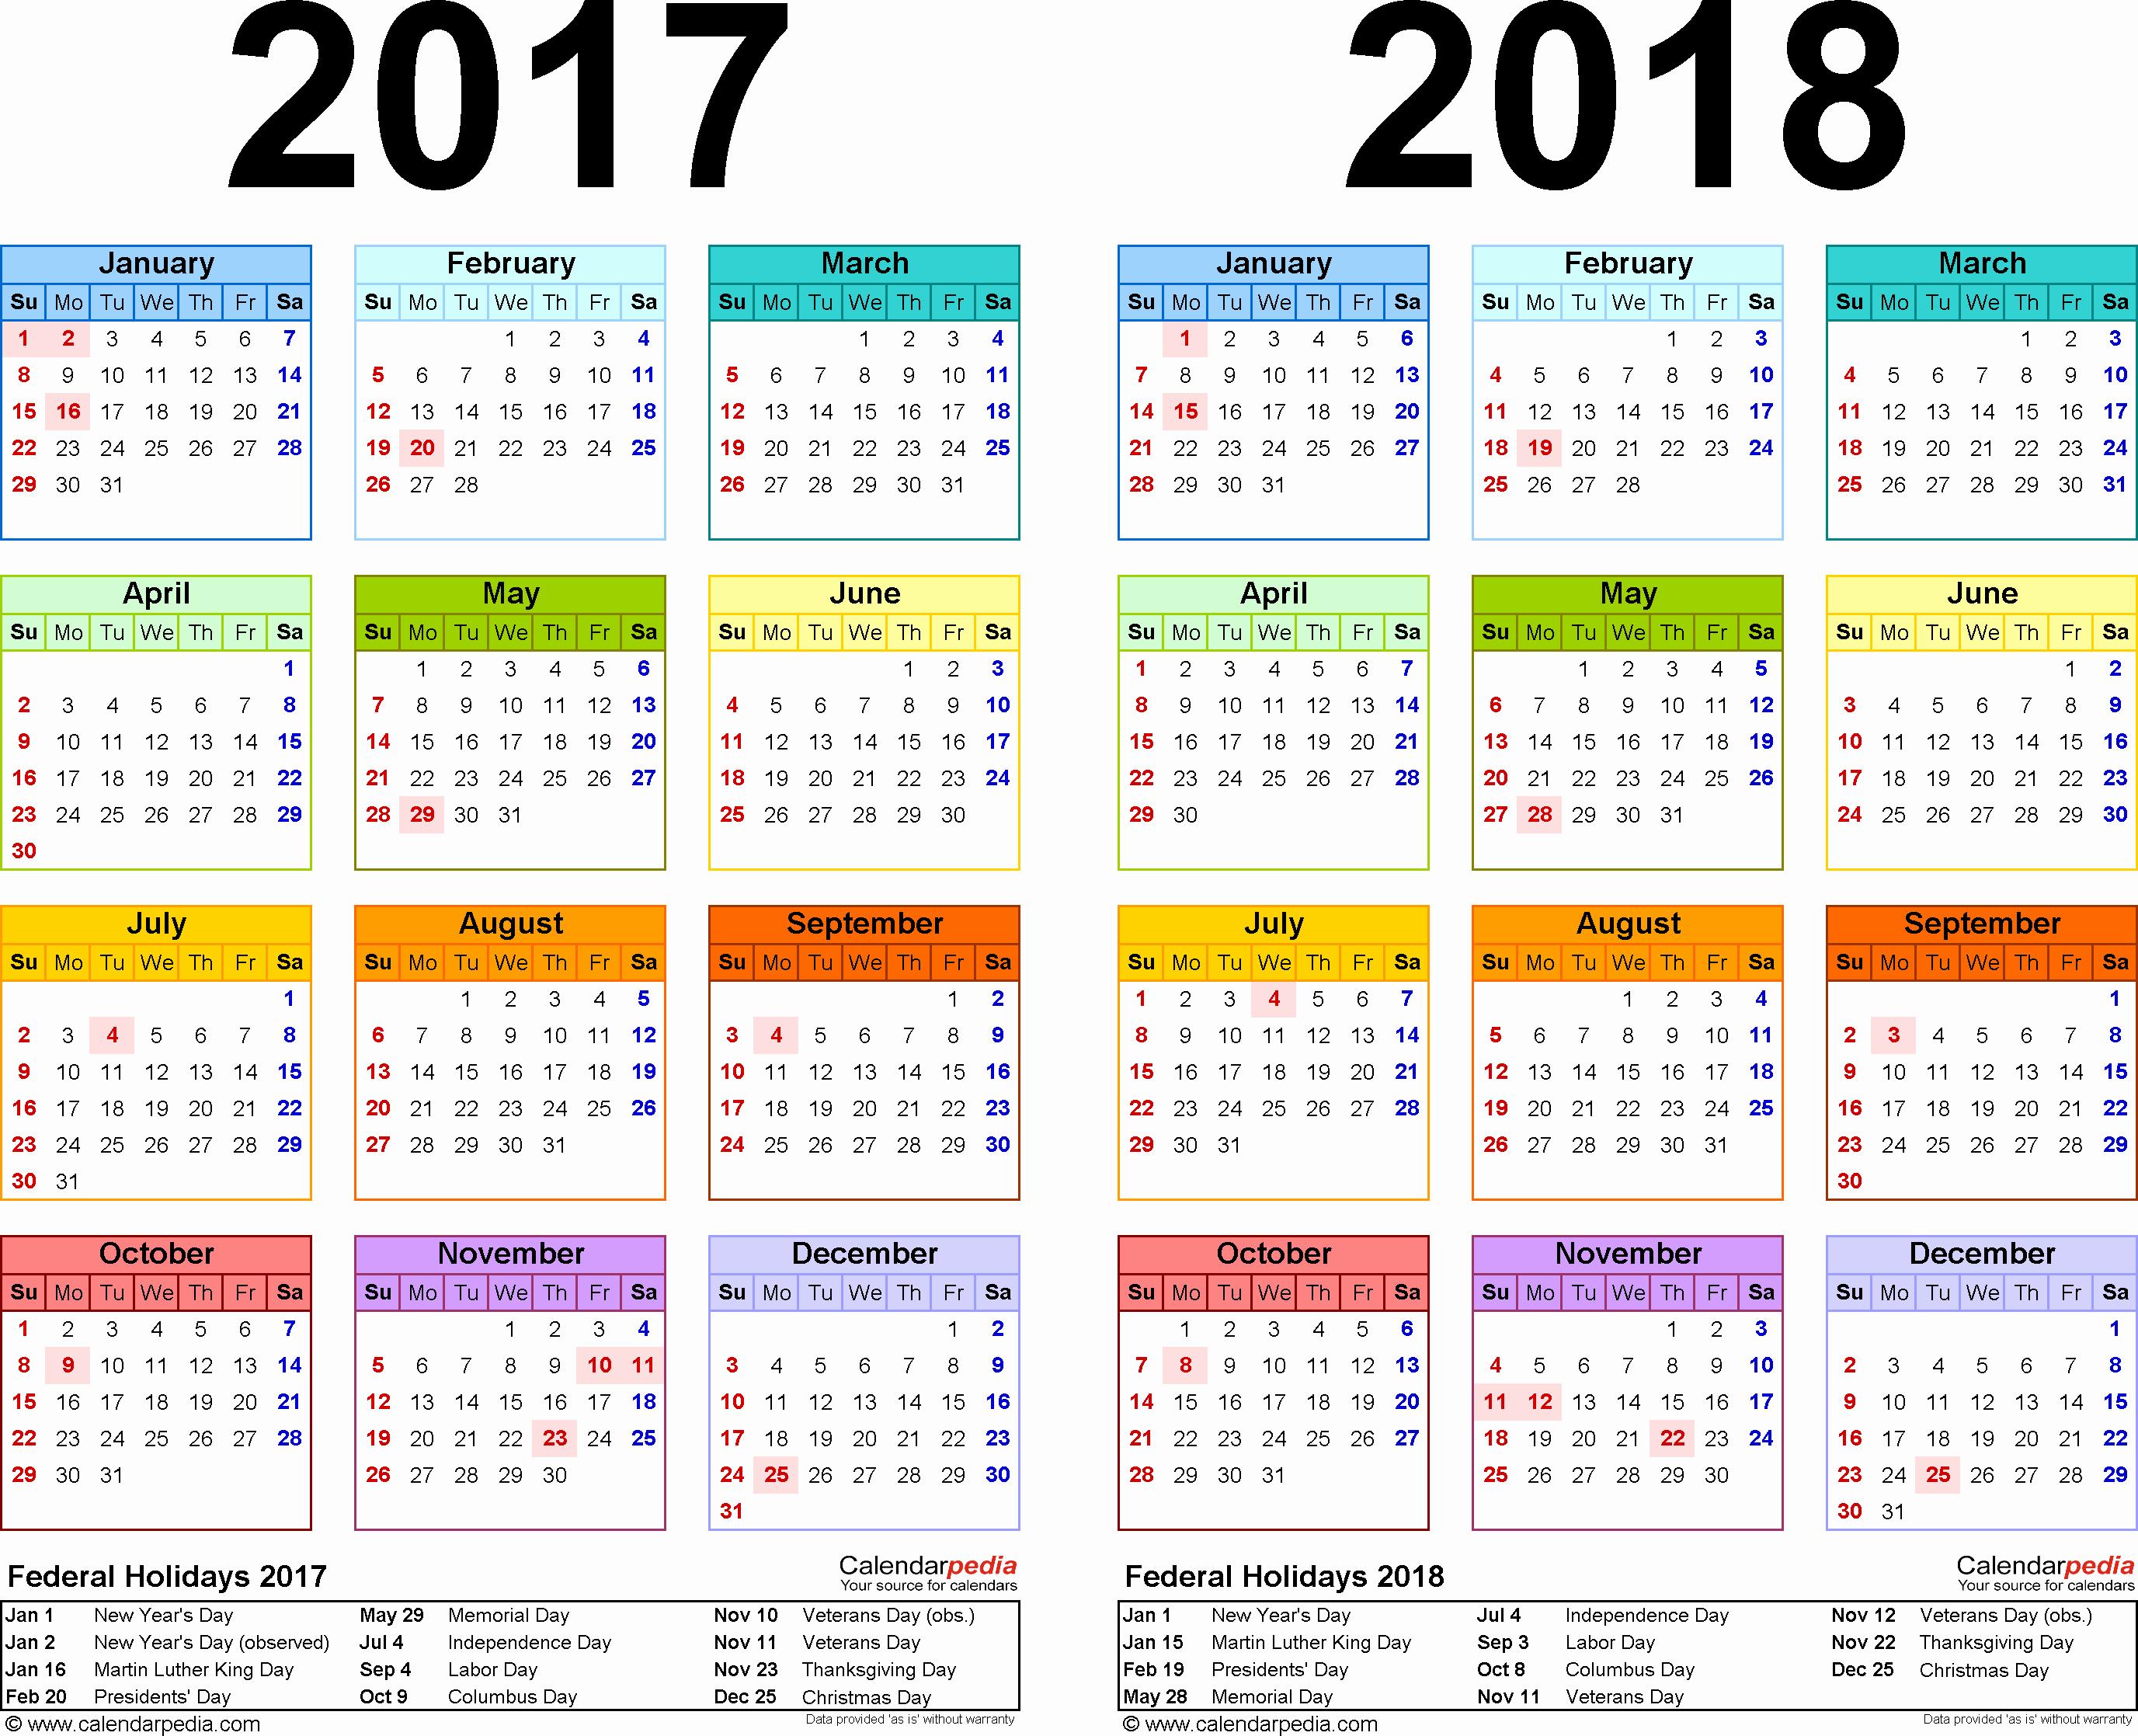 2017-18 Blank Calendar Inspirational 2017 2018 Calendar Free Printable Two Year Pdf Calendars